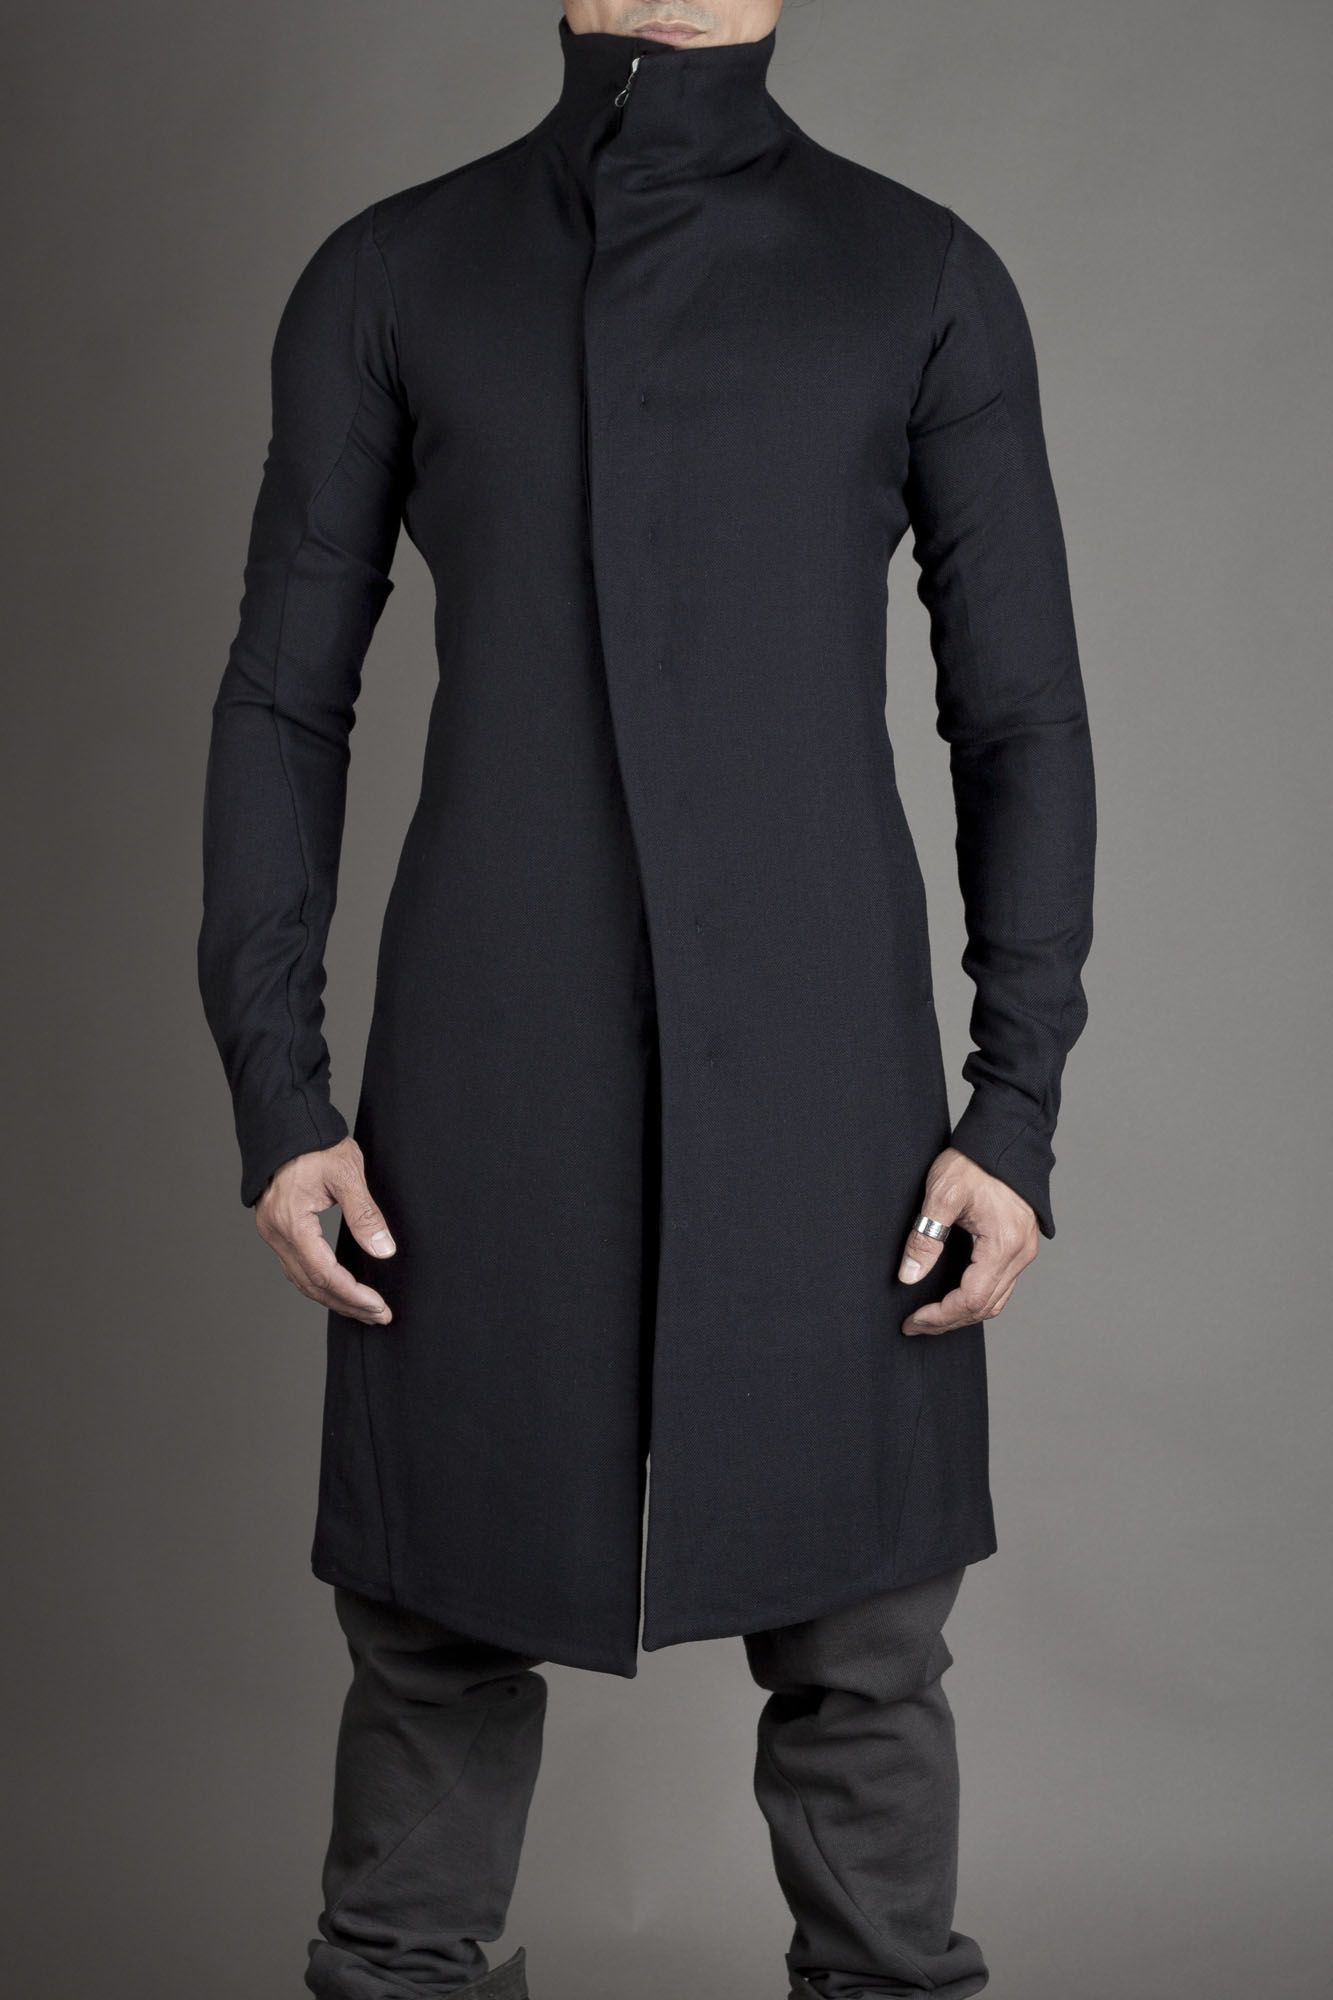 Blue/Black Fitted Coat, by Devoa FCT-NKH, Men's Fall